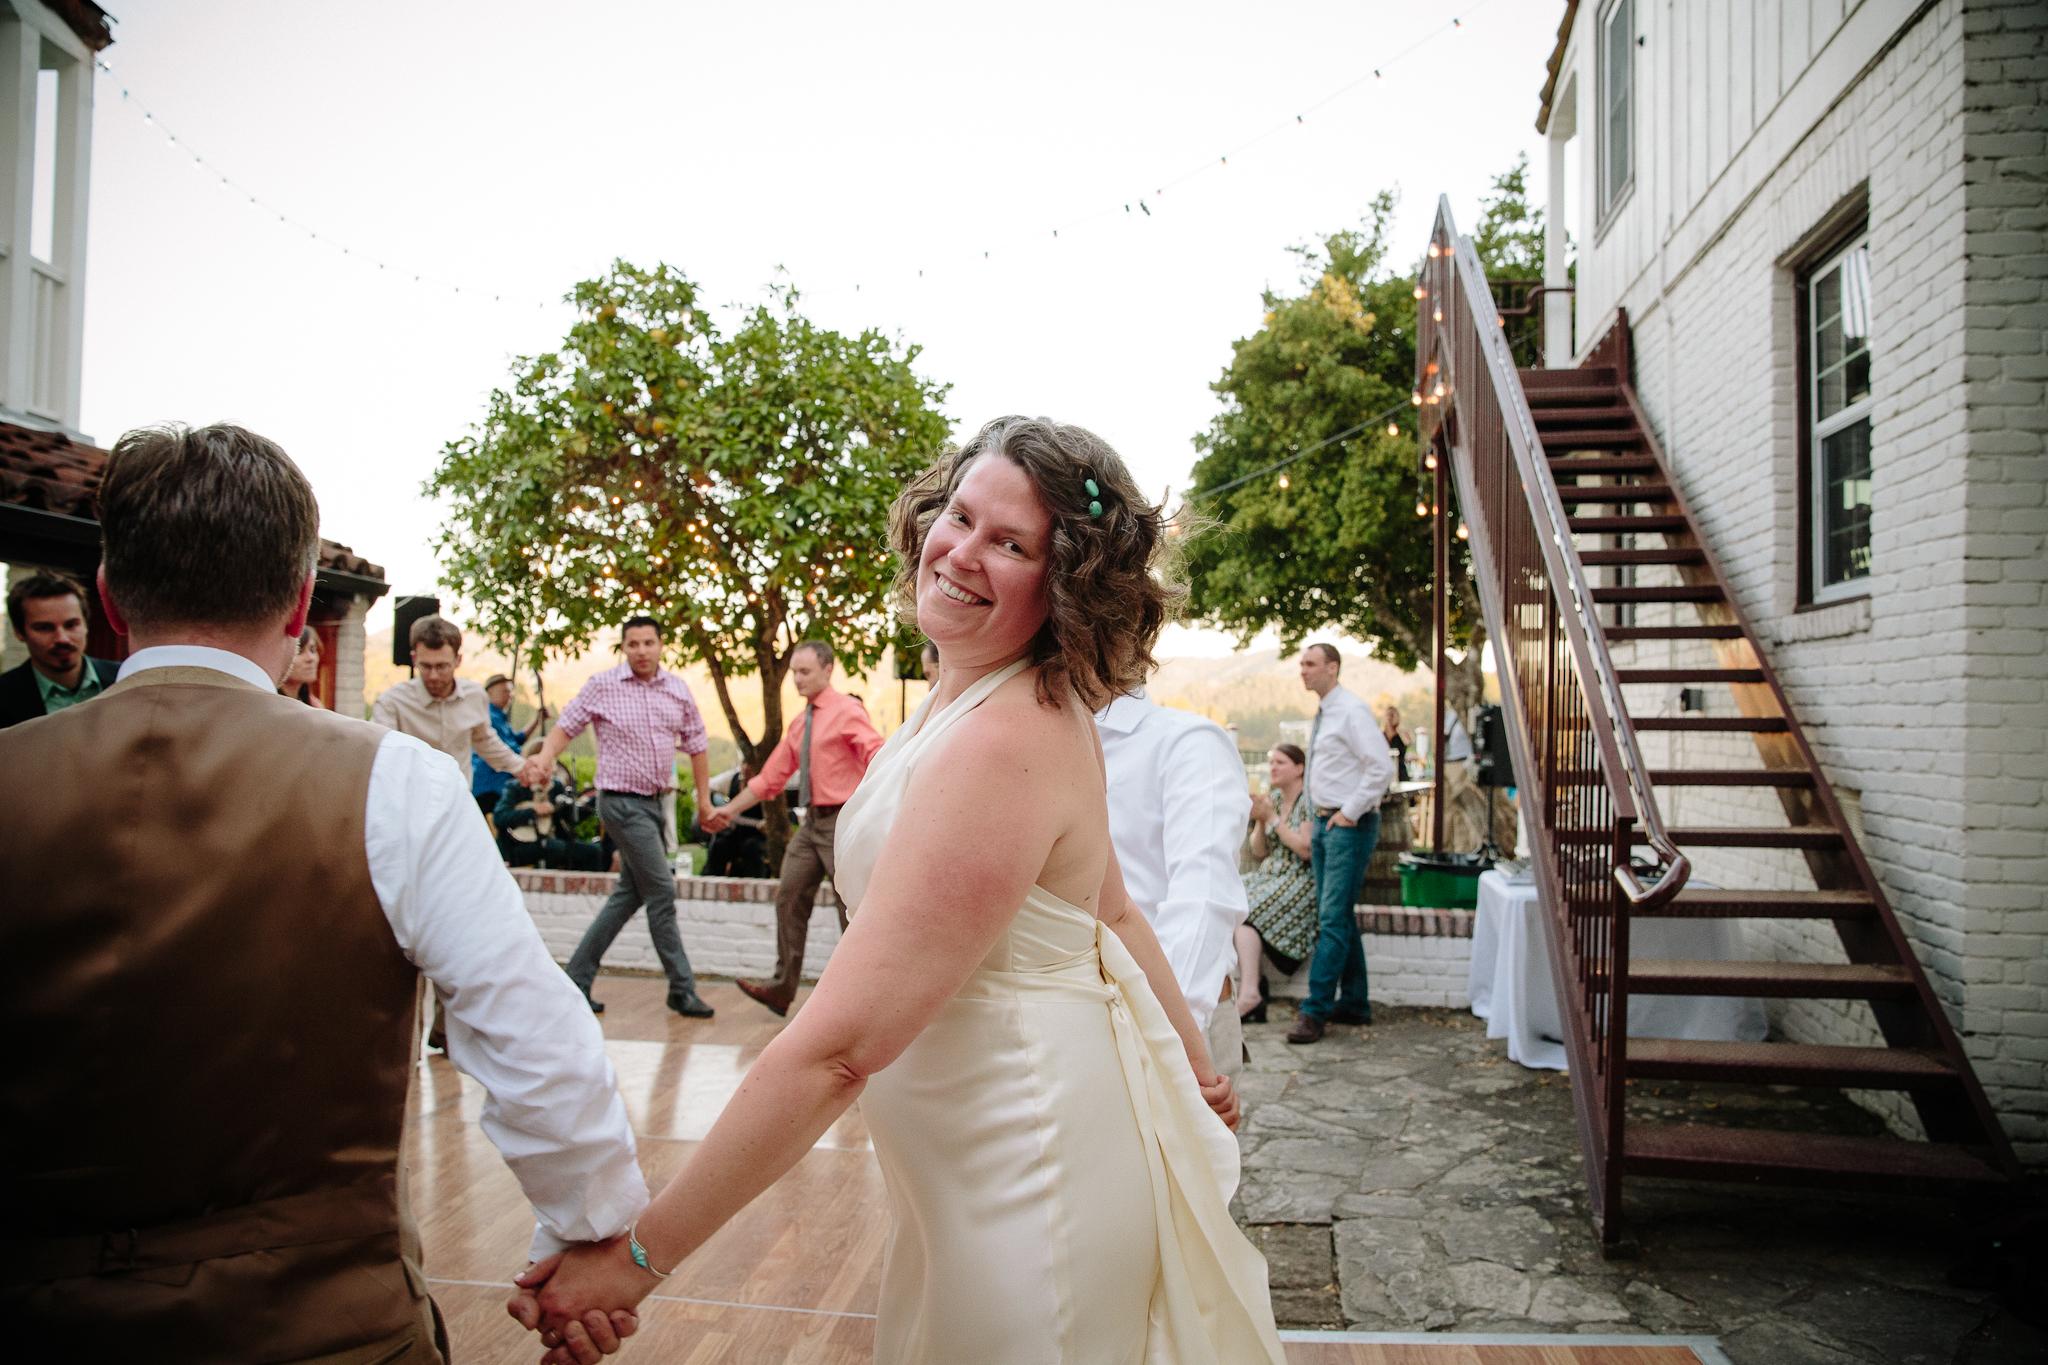 crystalchristiaan_weddingsneakpeek_2014_jenniferleahyphotography-37-of-43_14140041347_o.jpg